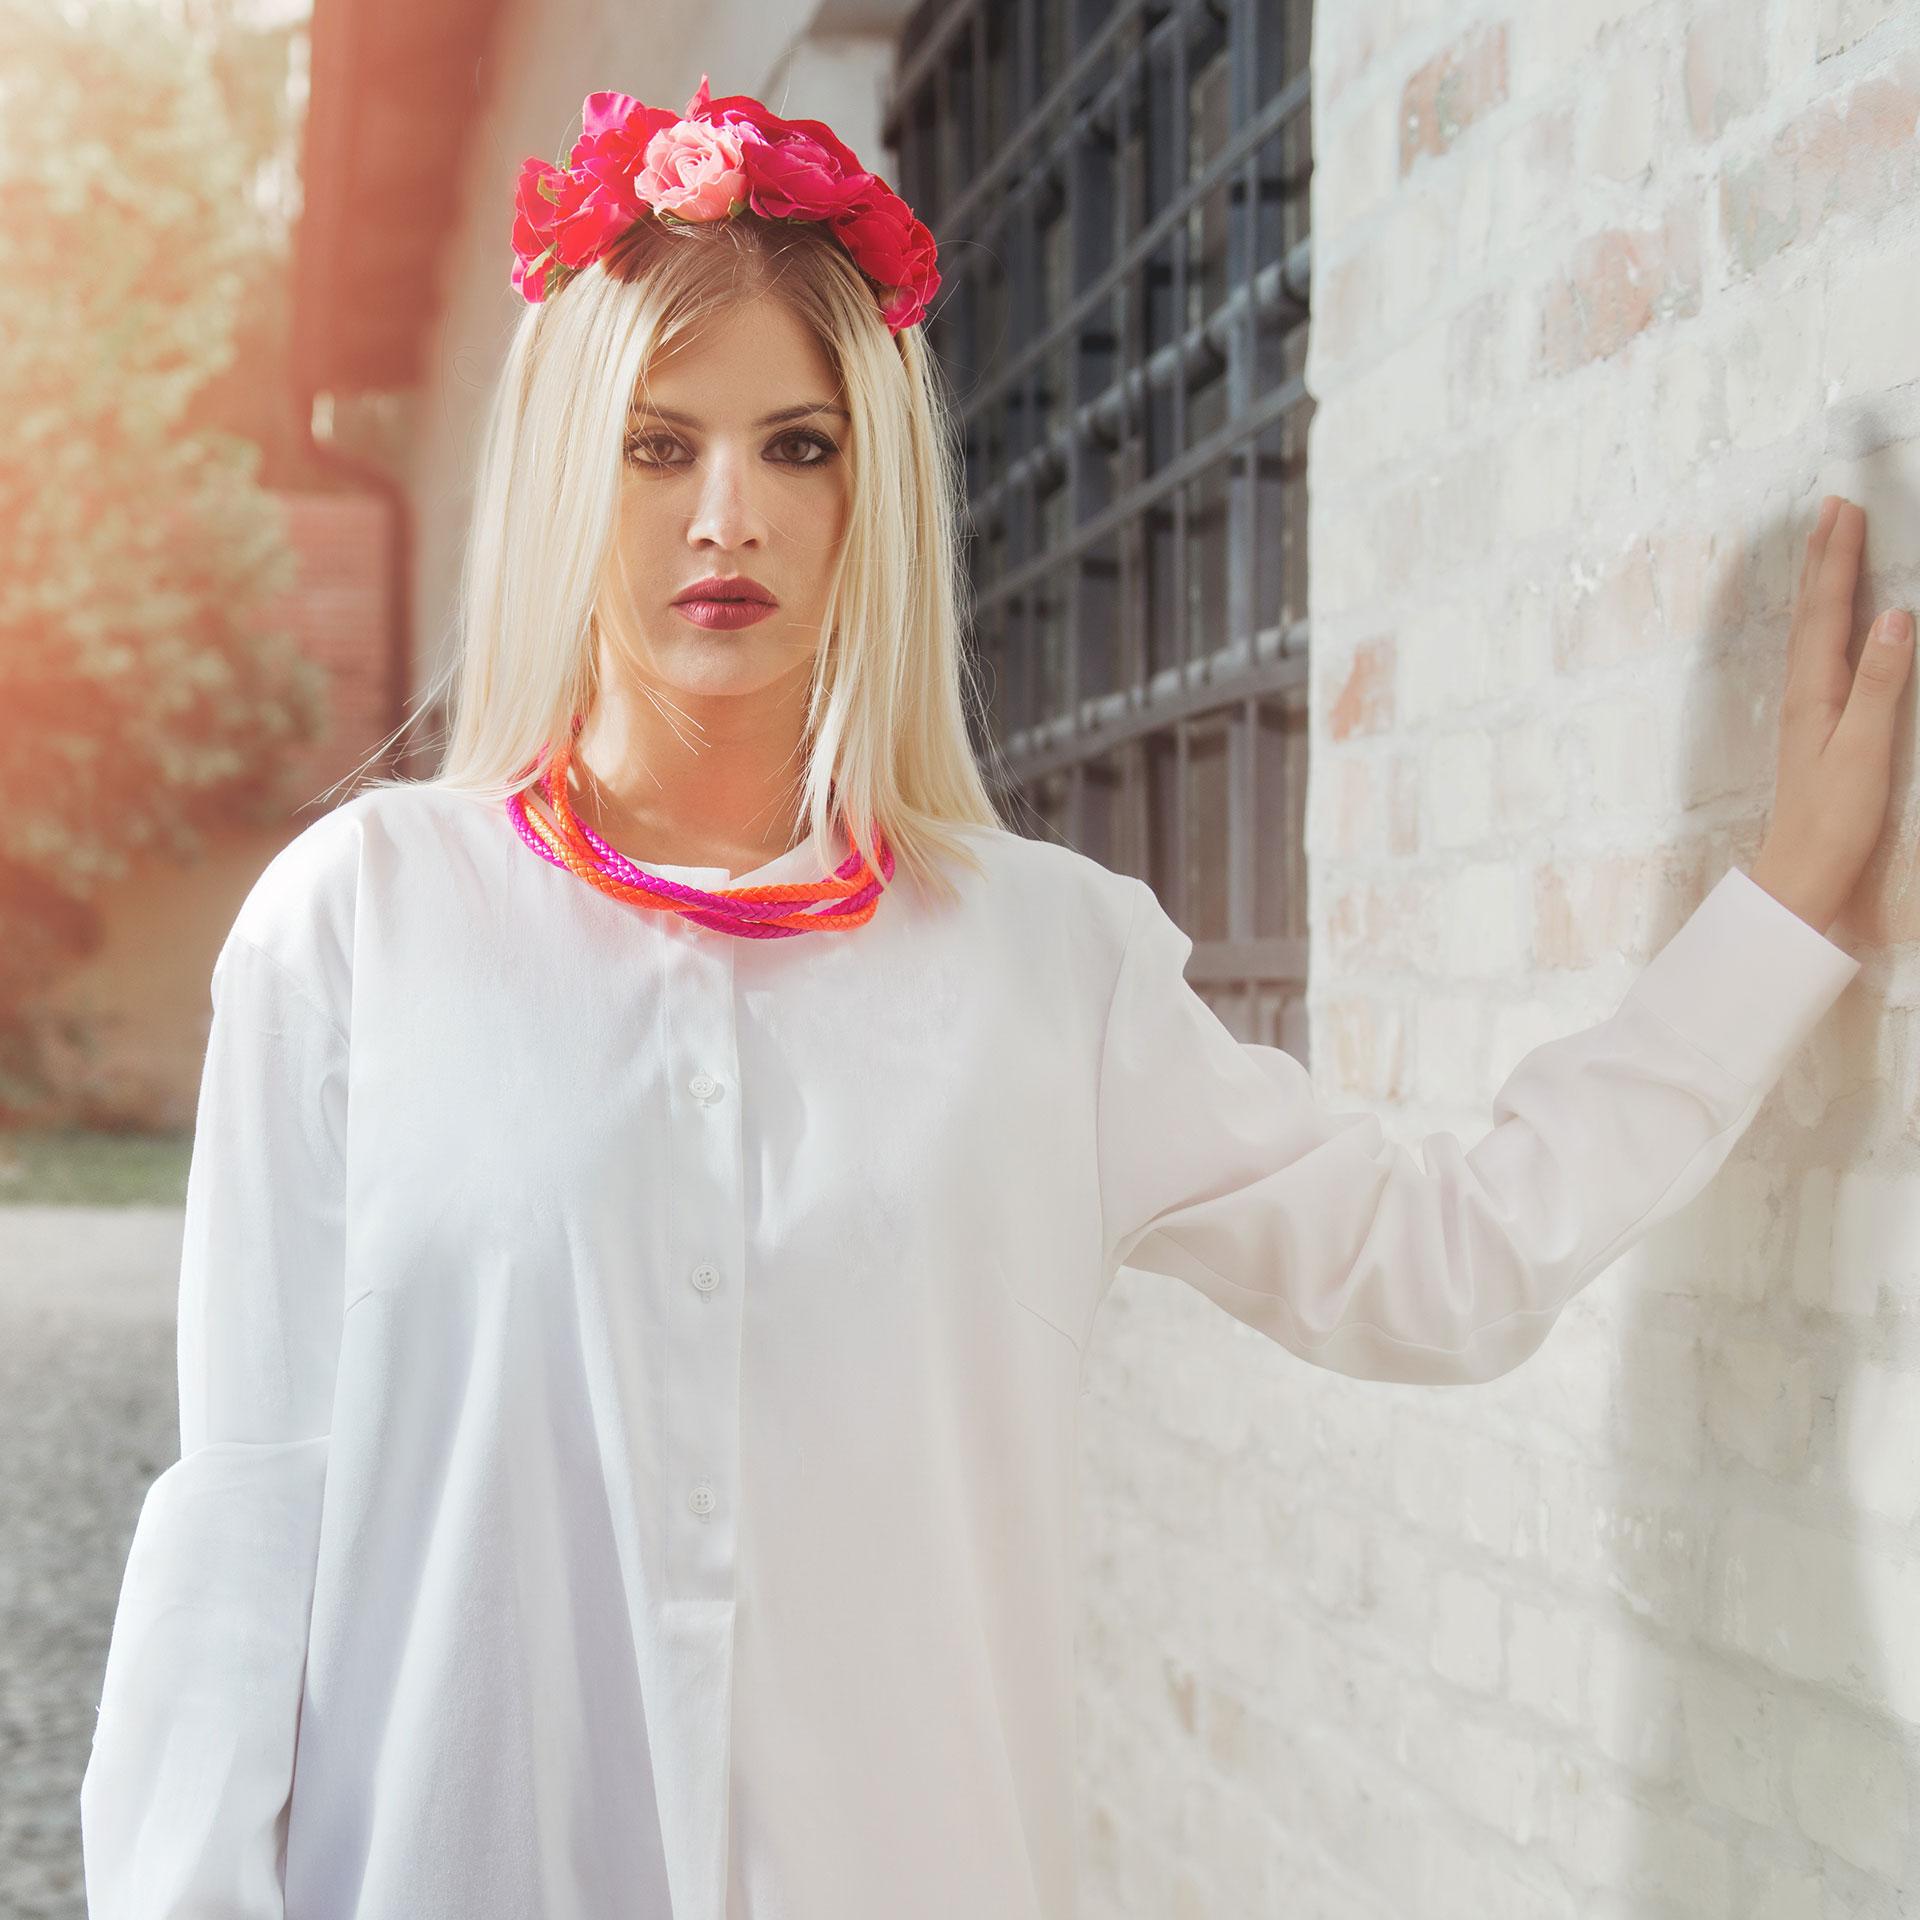 White long sleeve shirt dress with freedom print